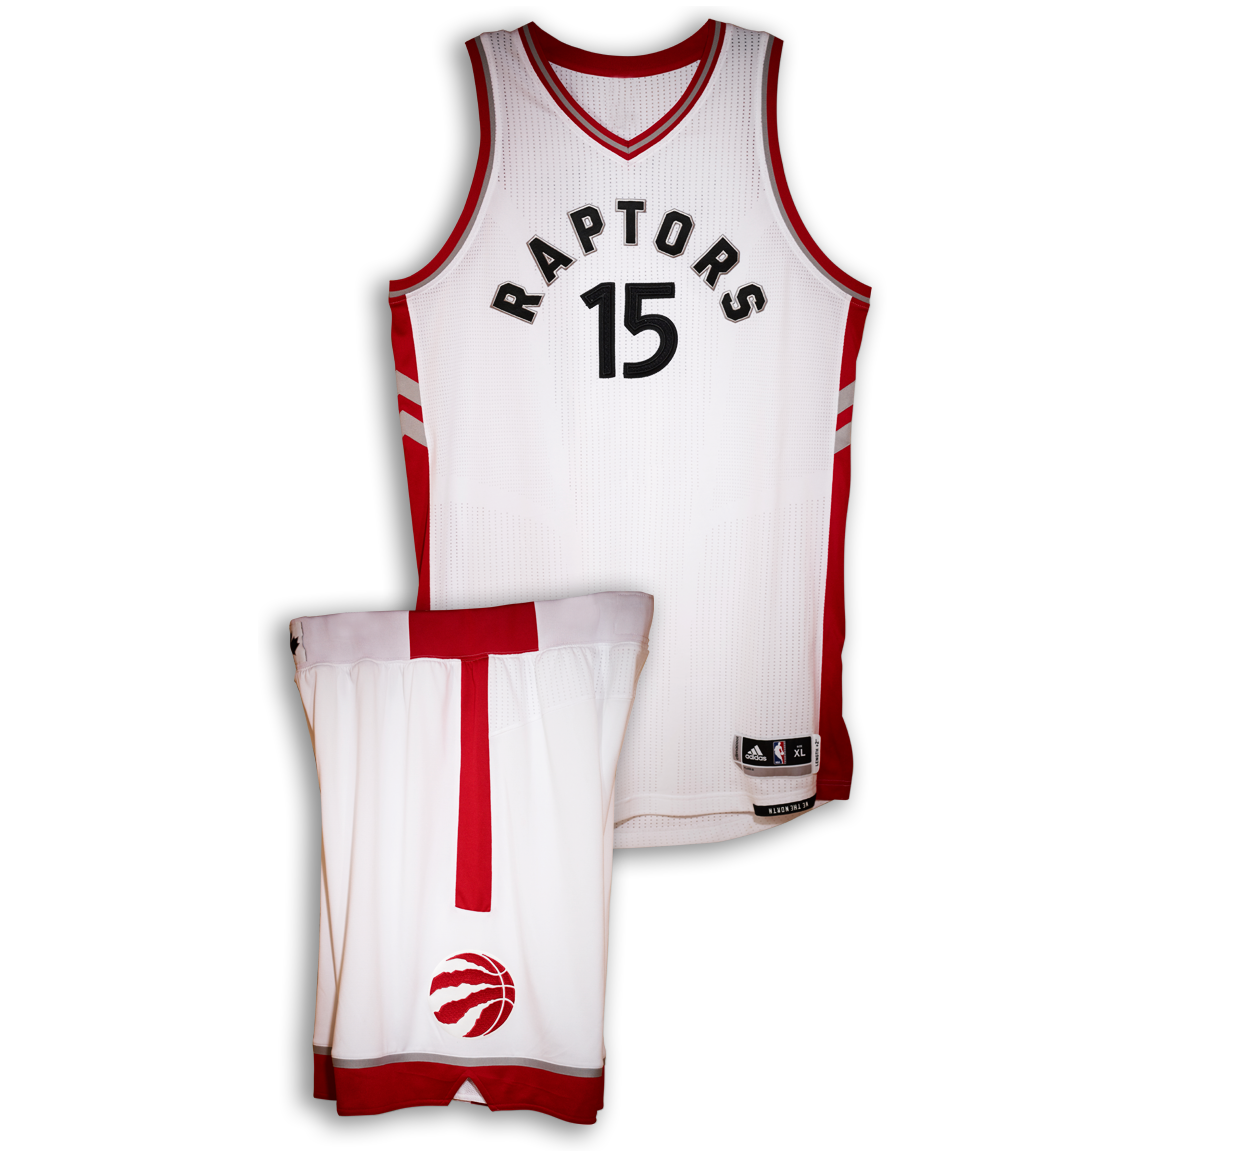 Toronto Raptors - Home uniform